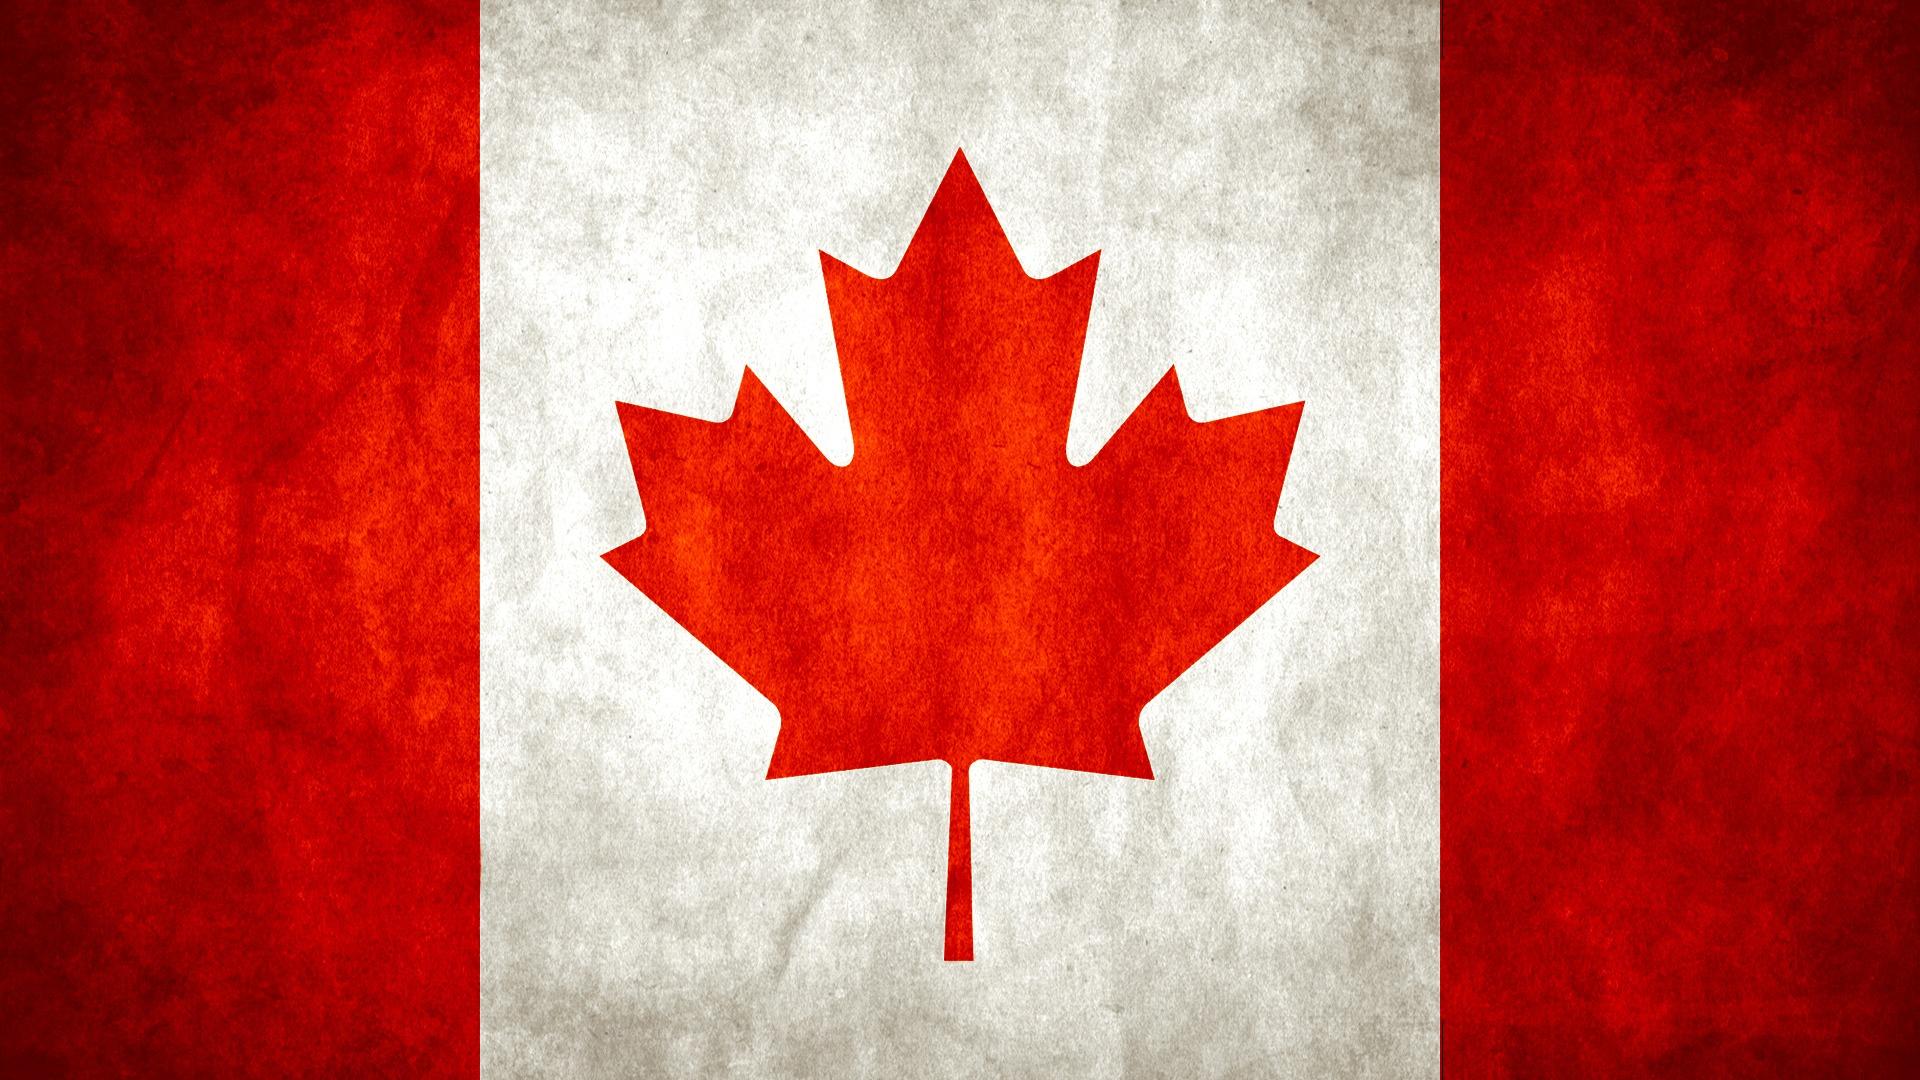 Download full size Canadian Flag Digital Art wallpaper / 1920x1080